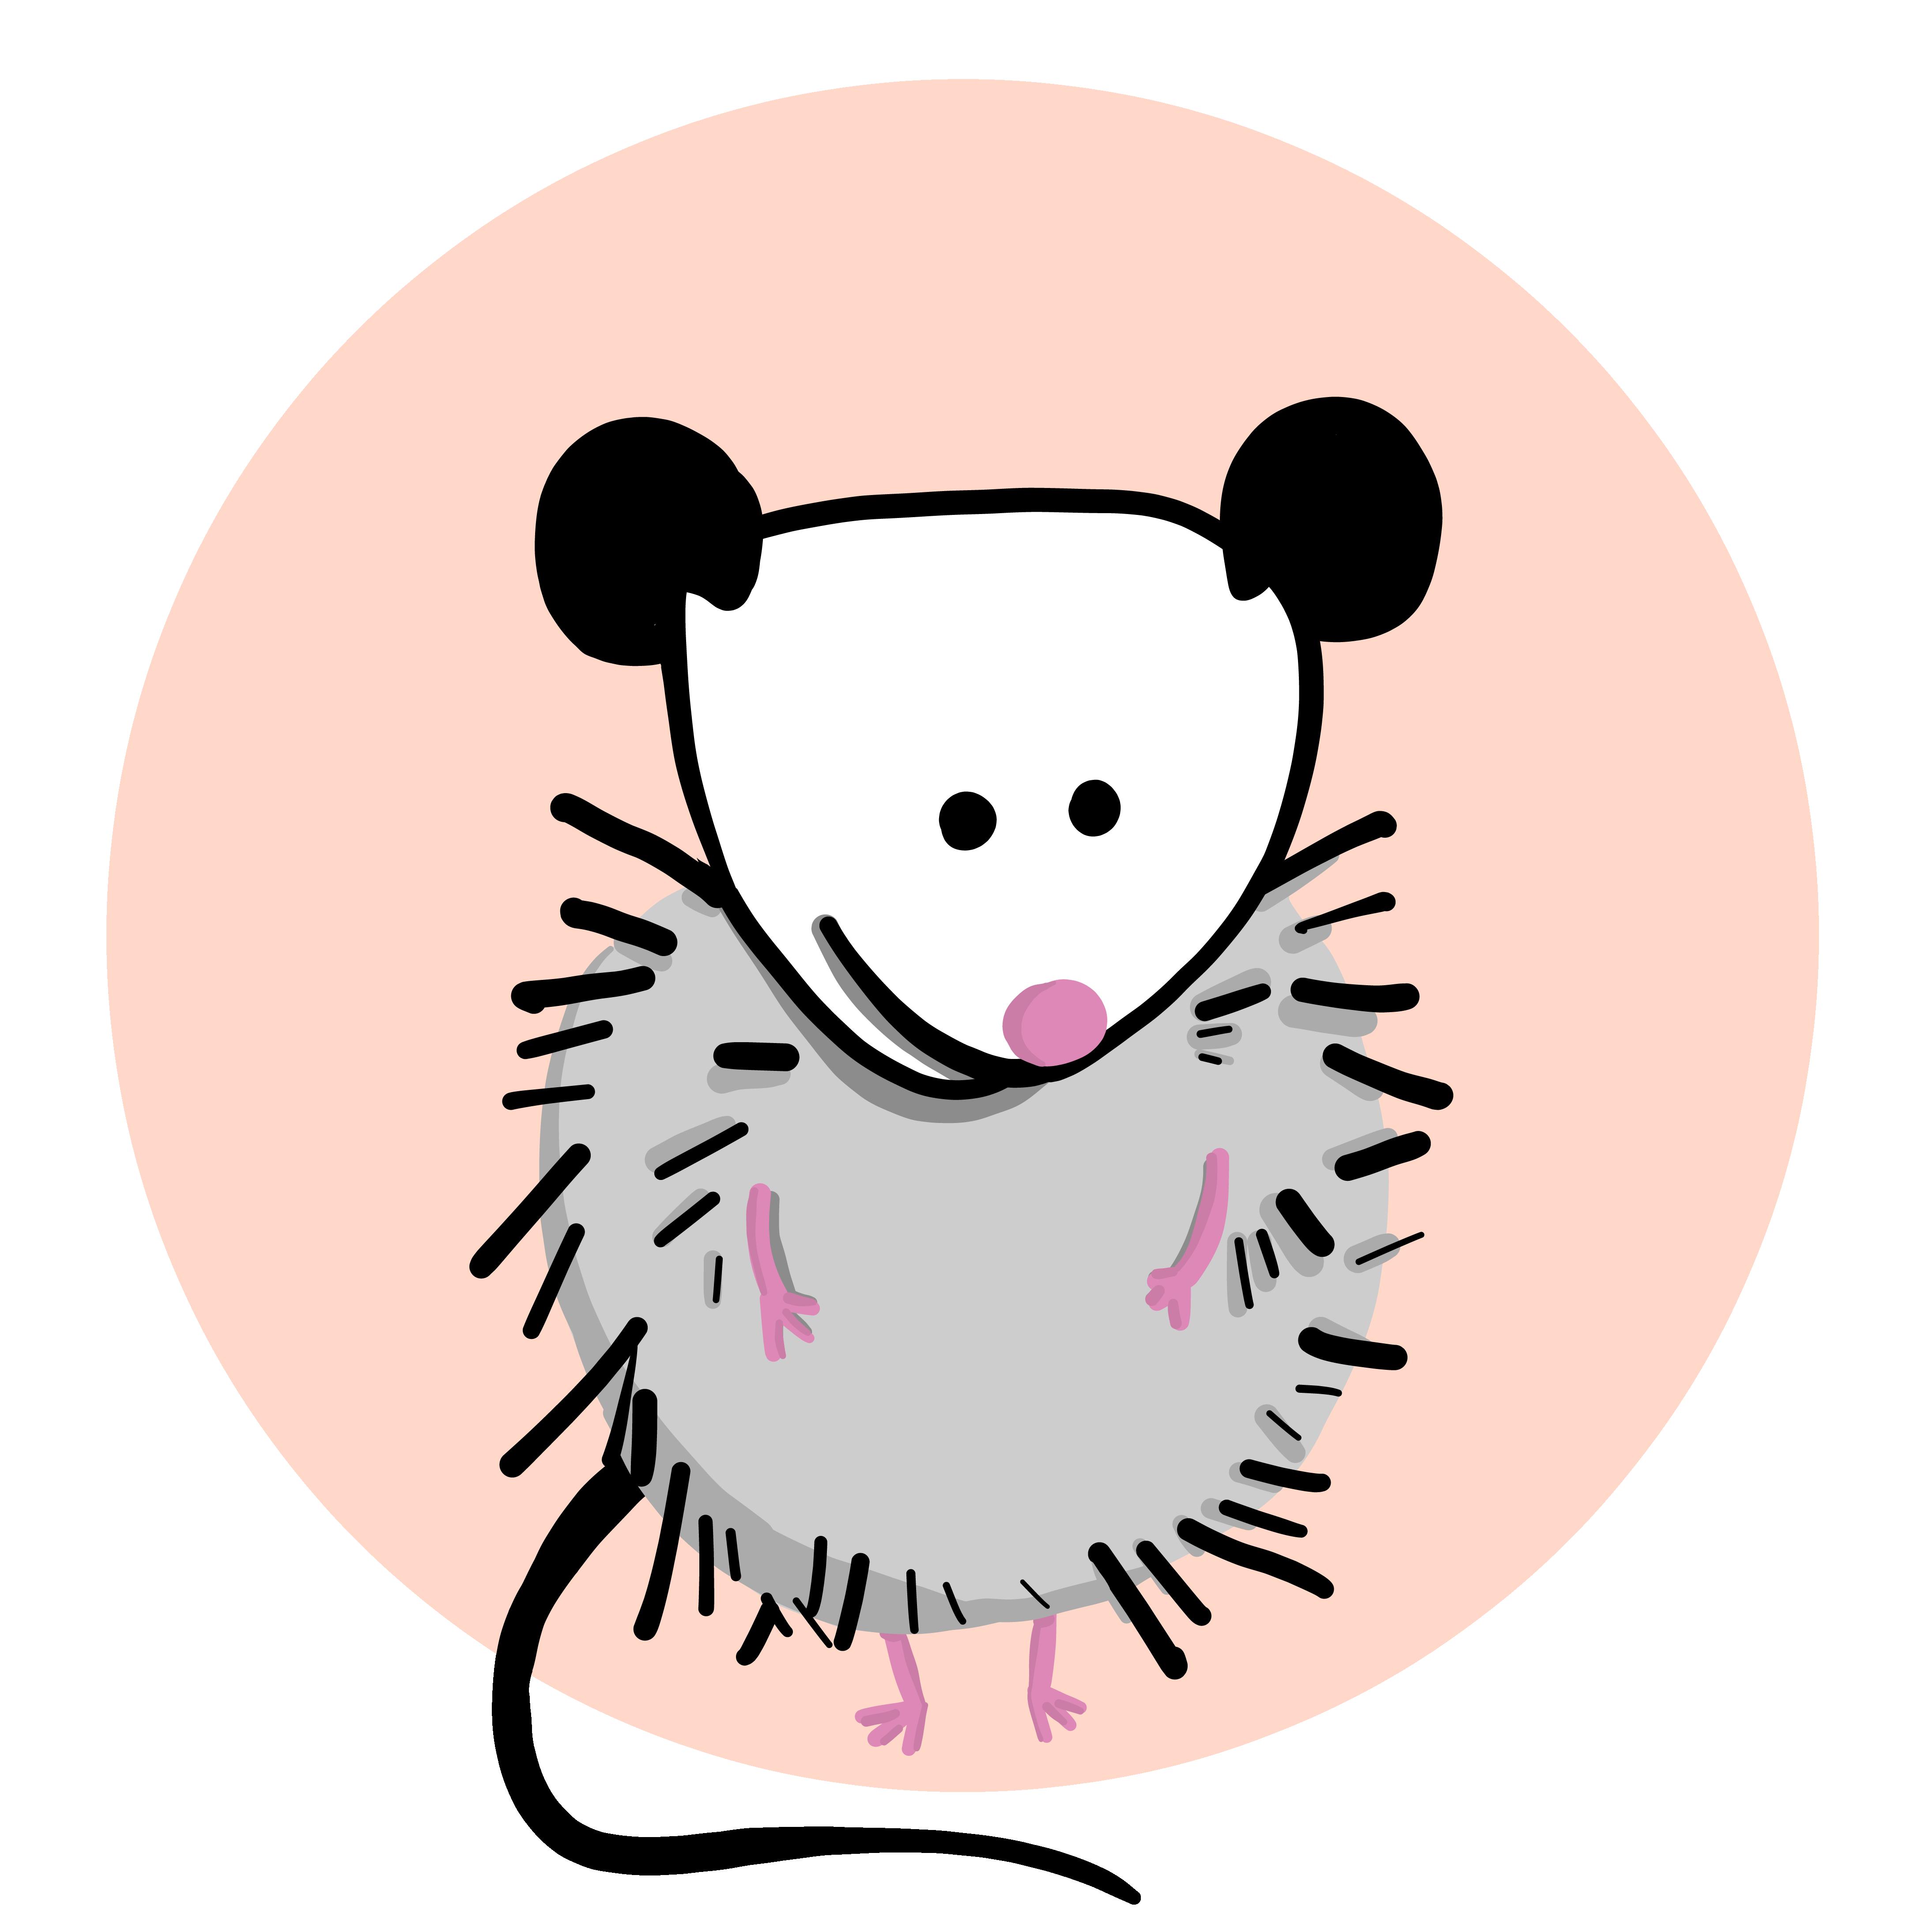 Baby Petunia messages sticker-0